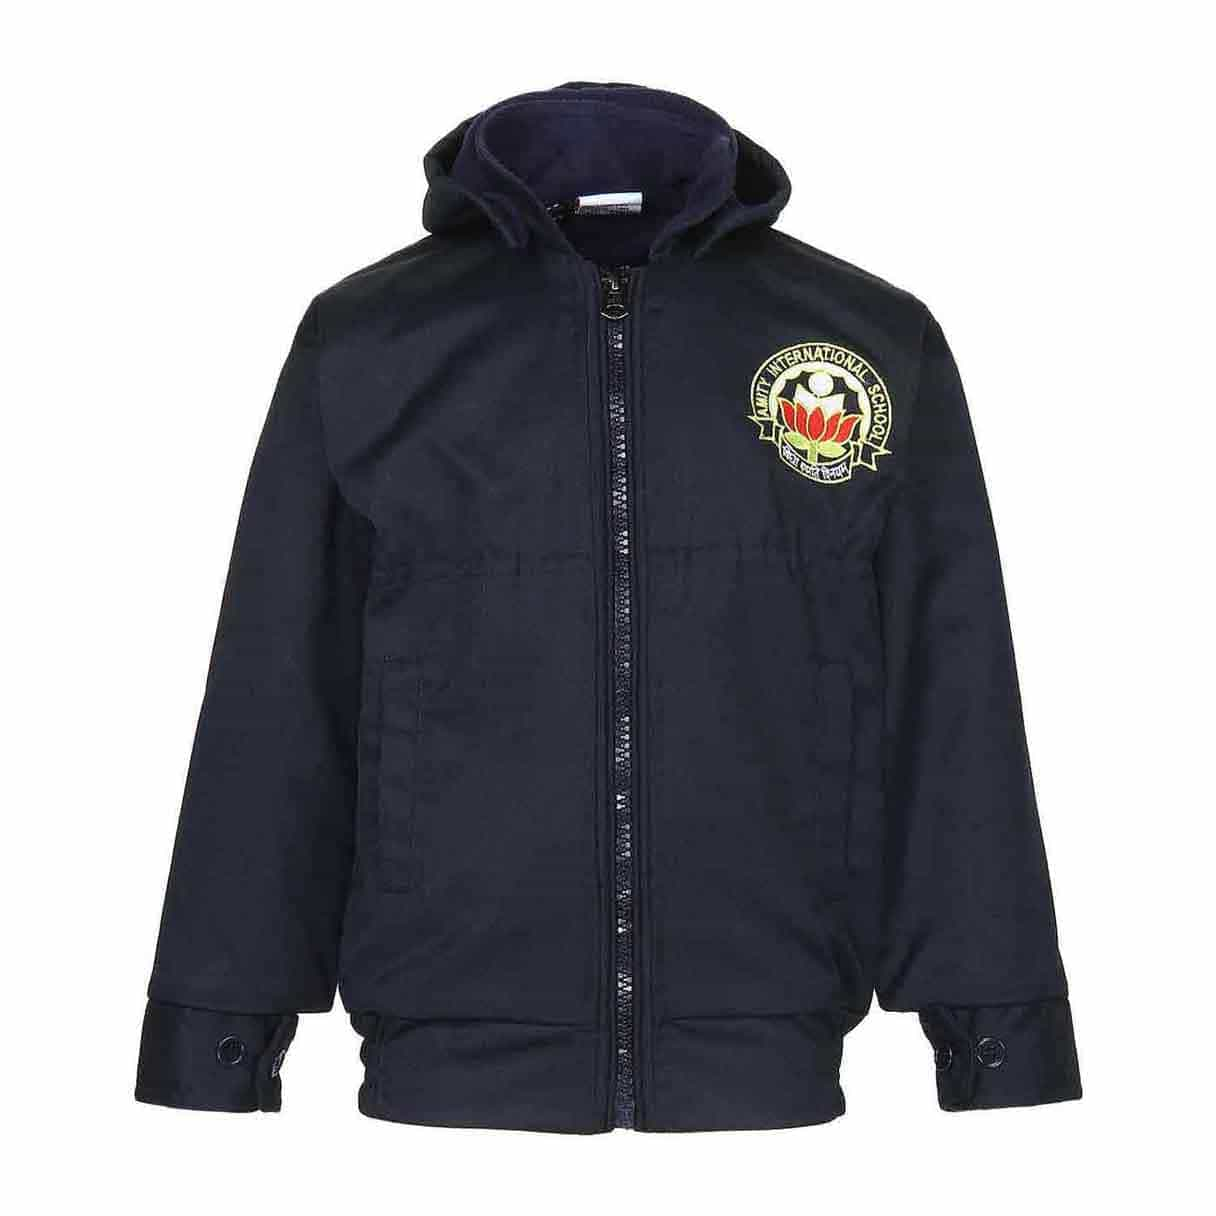 Amity Winter Blue Full Sleeves Jacket - Class Nursery to 1st